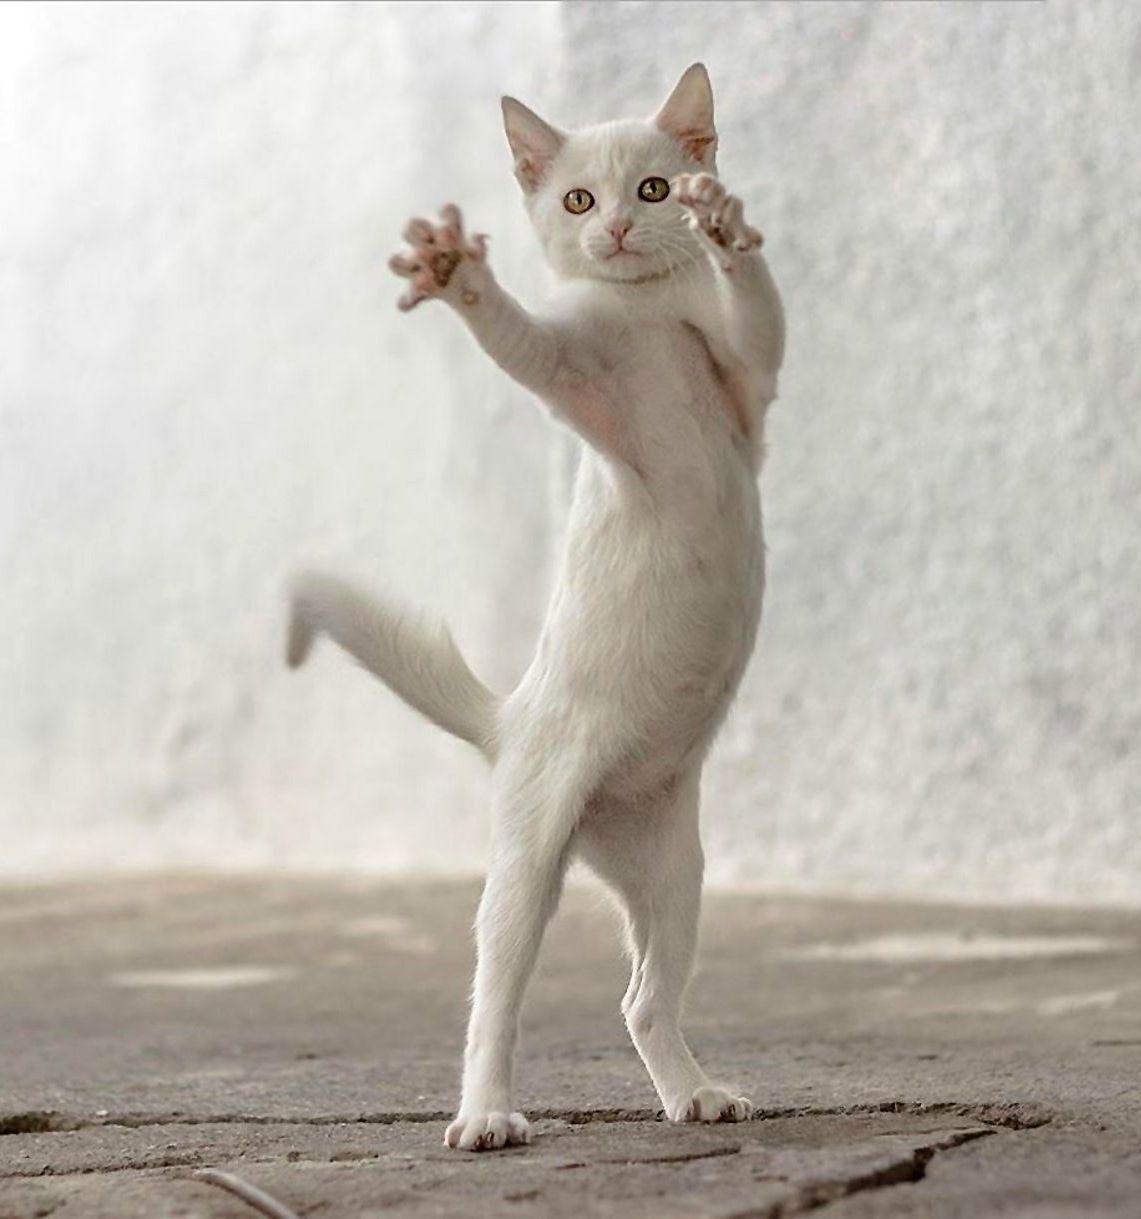 Jazz Hands Photo By Mitsuaki Iwago Dancing Cat Animals Cute Animals